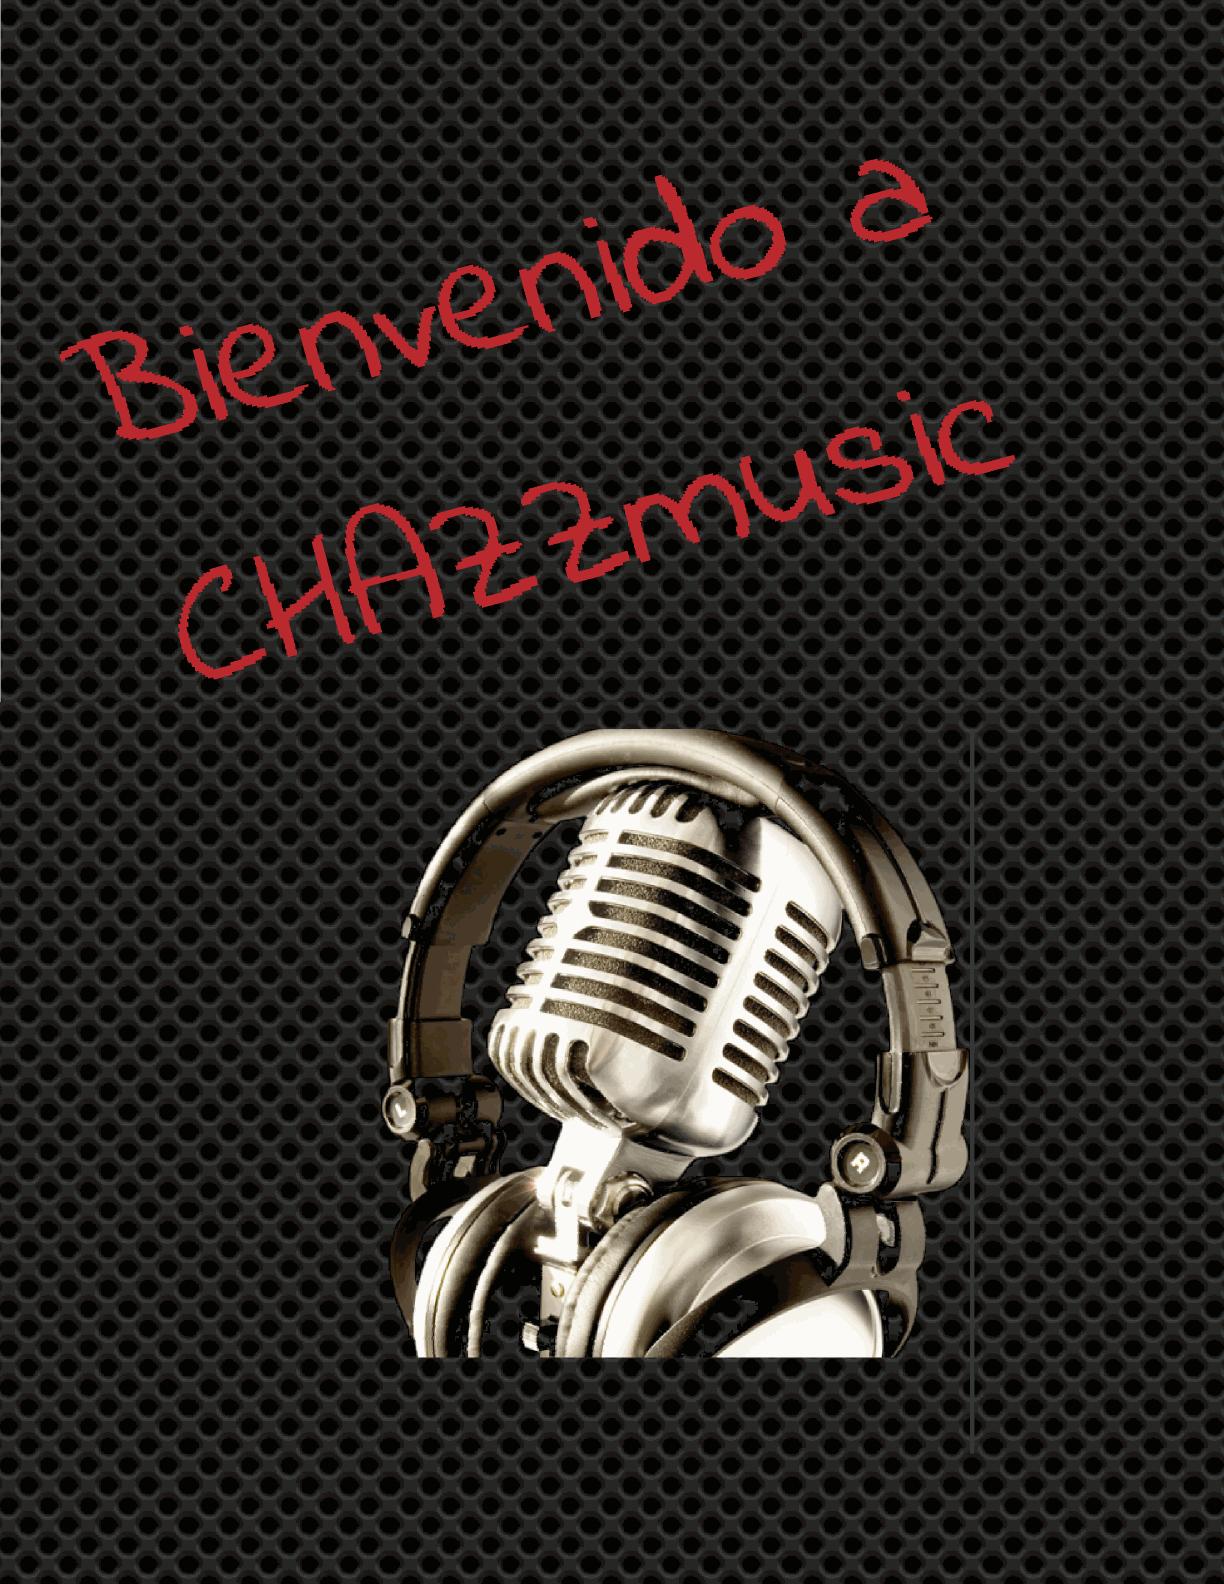 Chazz Music